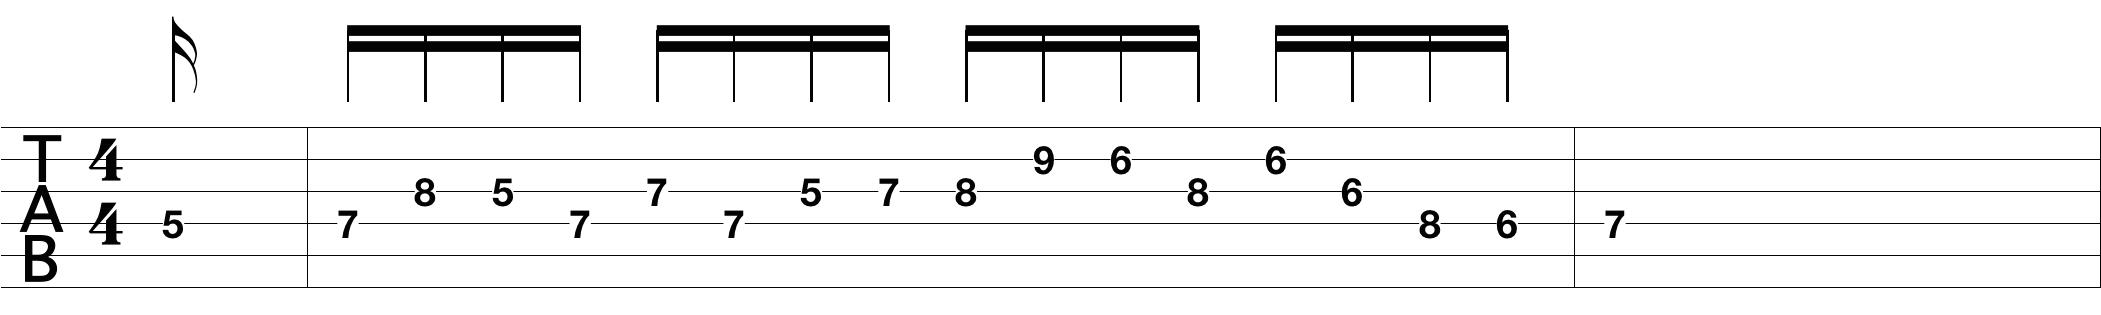 fusion-guitar-licks_2.png